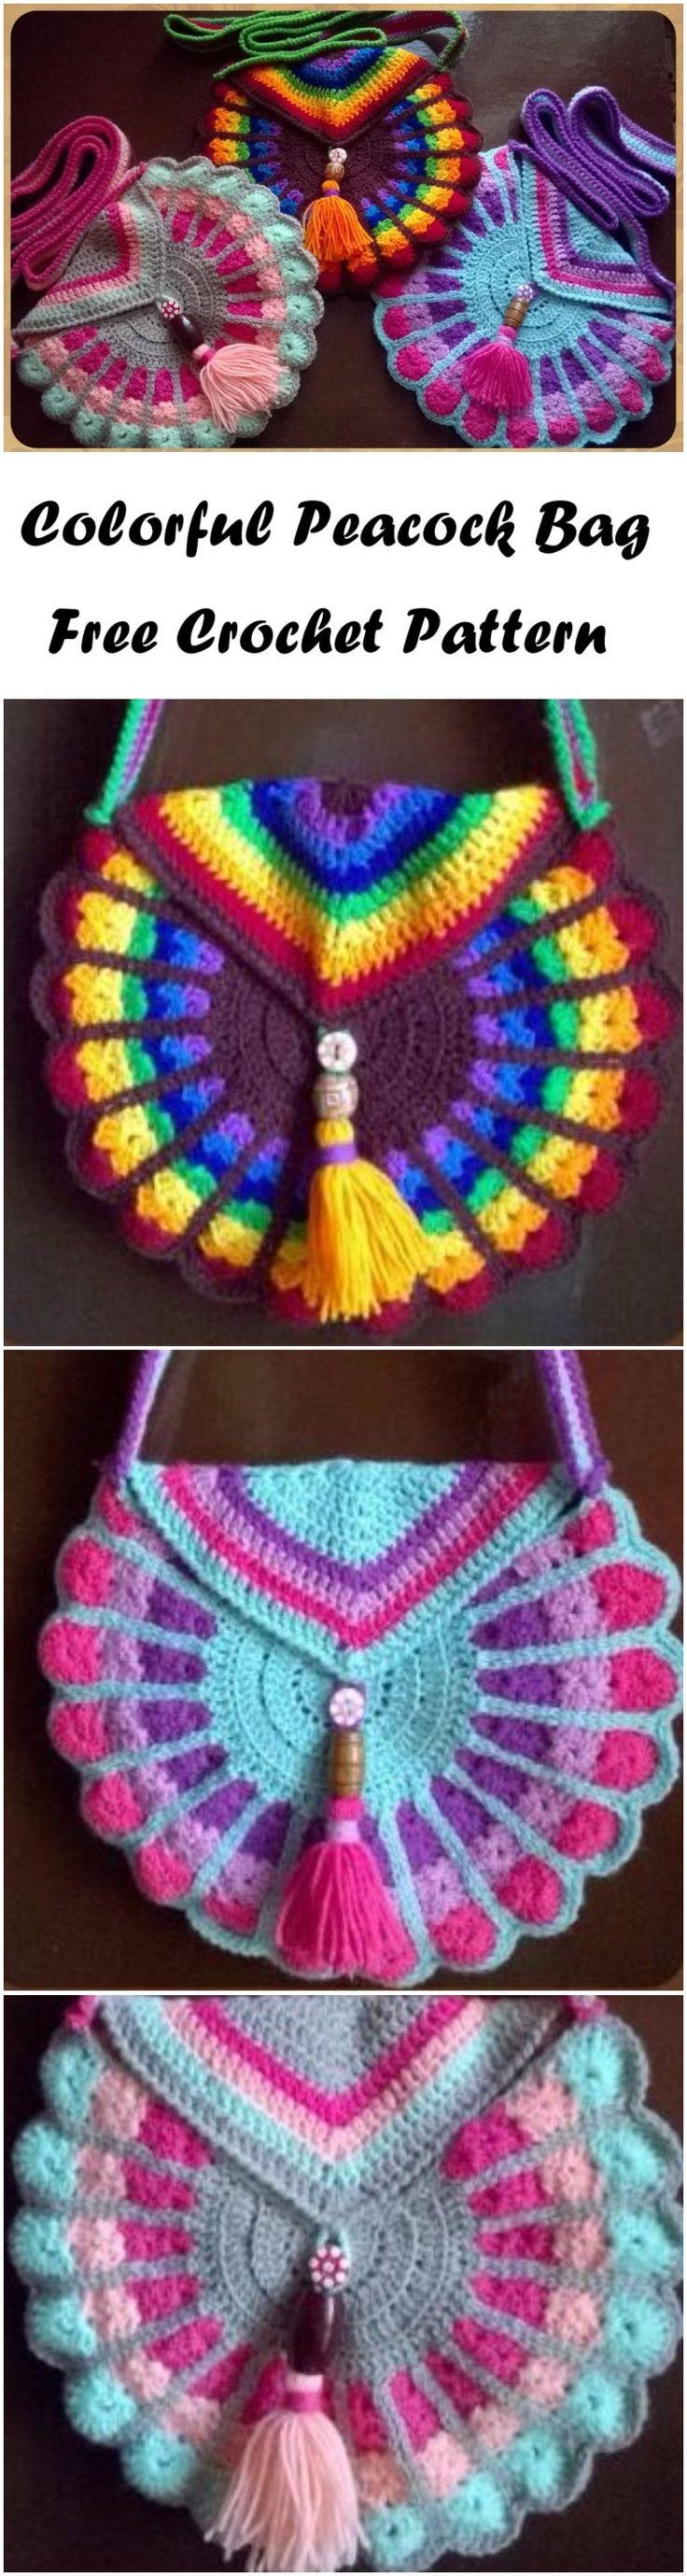 Crochet Colorful Peacock Bag Free pattern